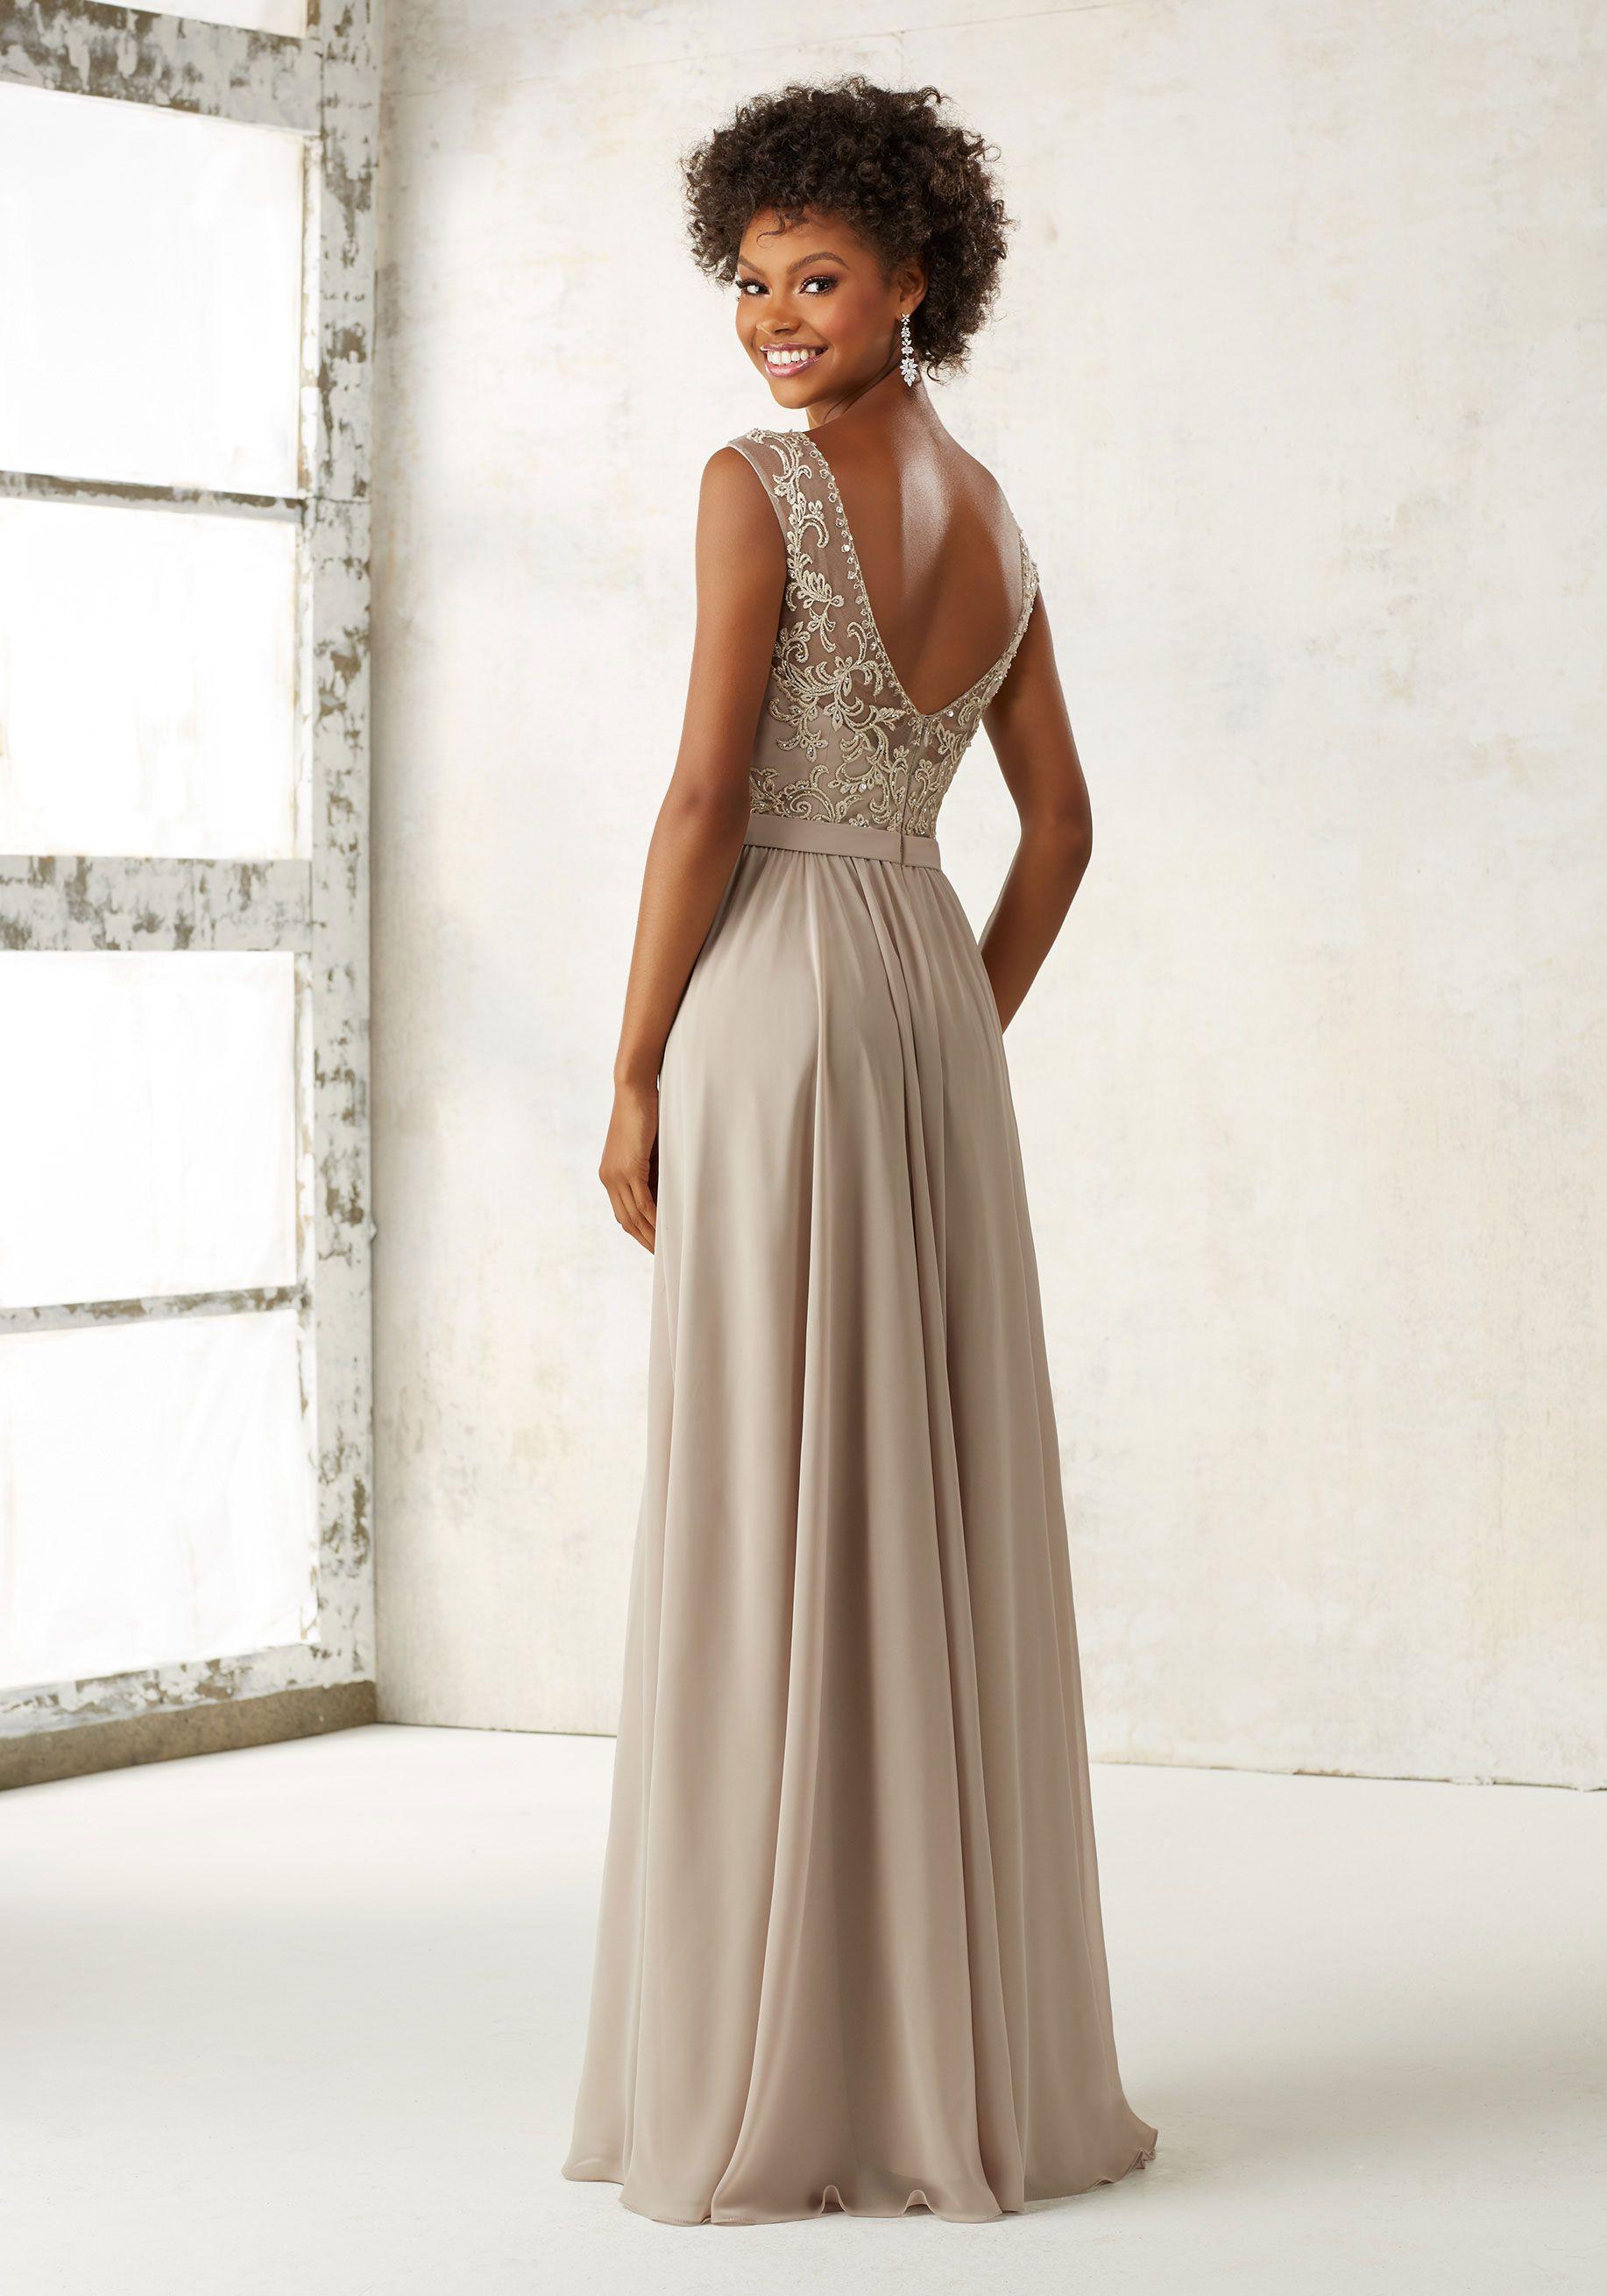 Morilee by Madeline Gardner Bridesmaids Style 21522 | Ornate ...